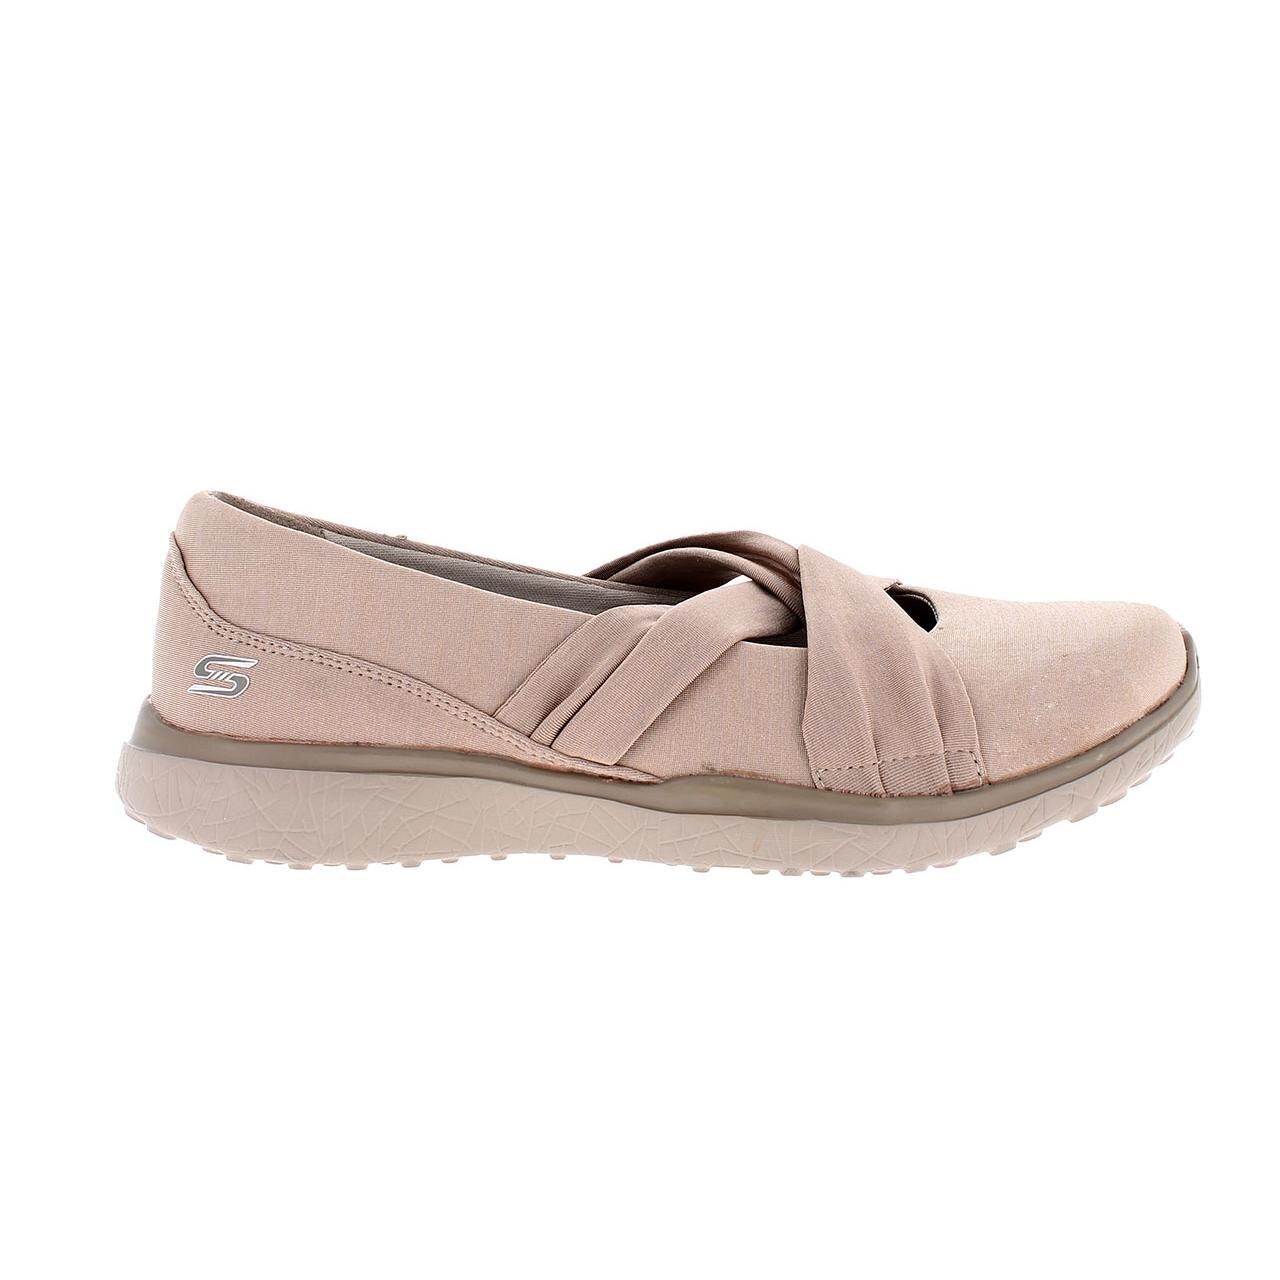 Skechers Mujer Marrón Tpe Zapatillas Nh0wayq On Textil Slip 23562 qw7BXOI